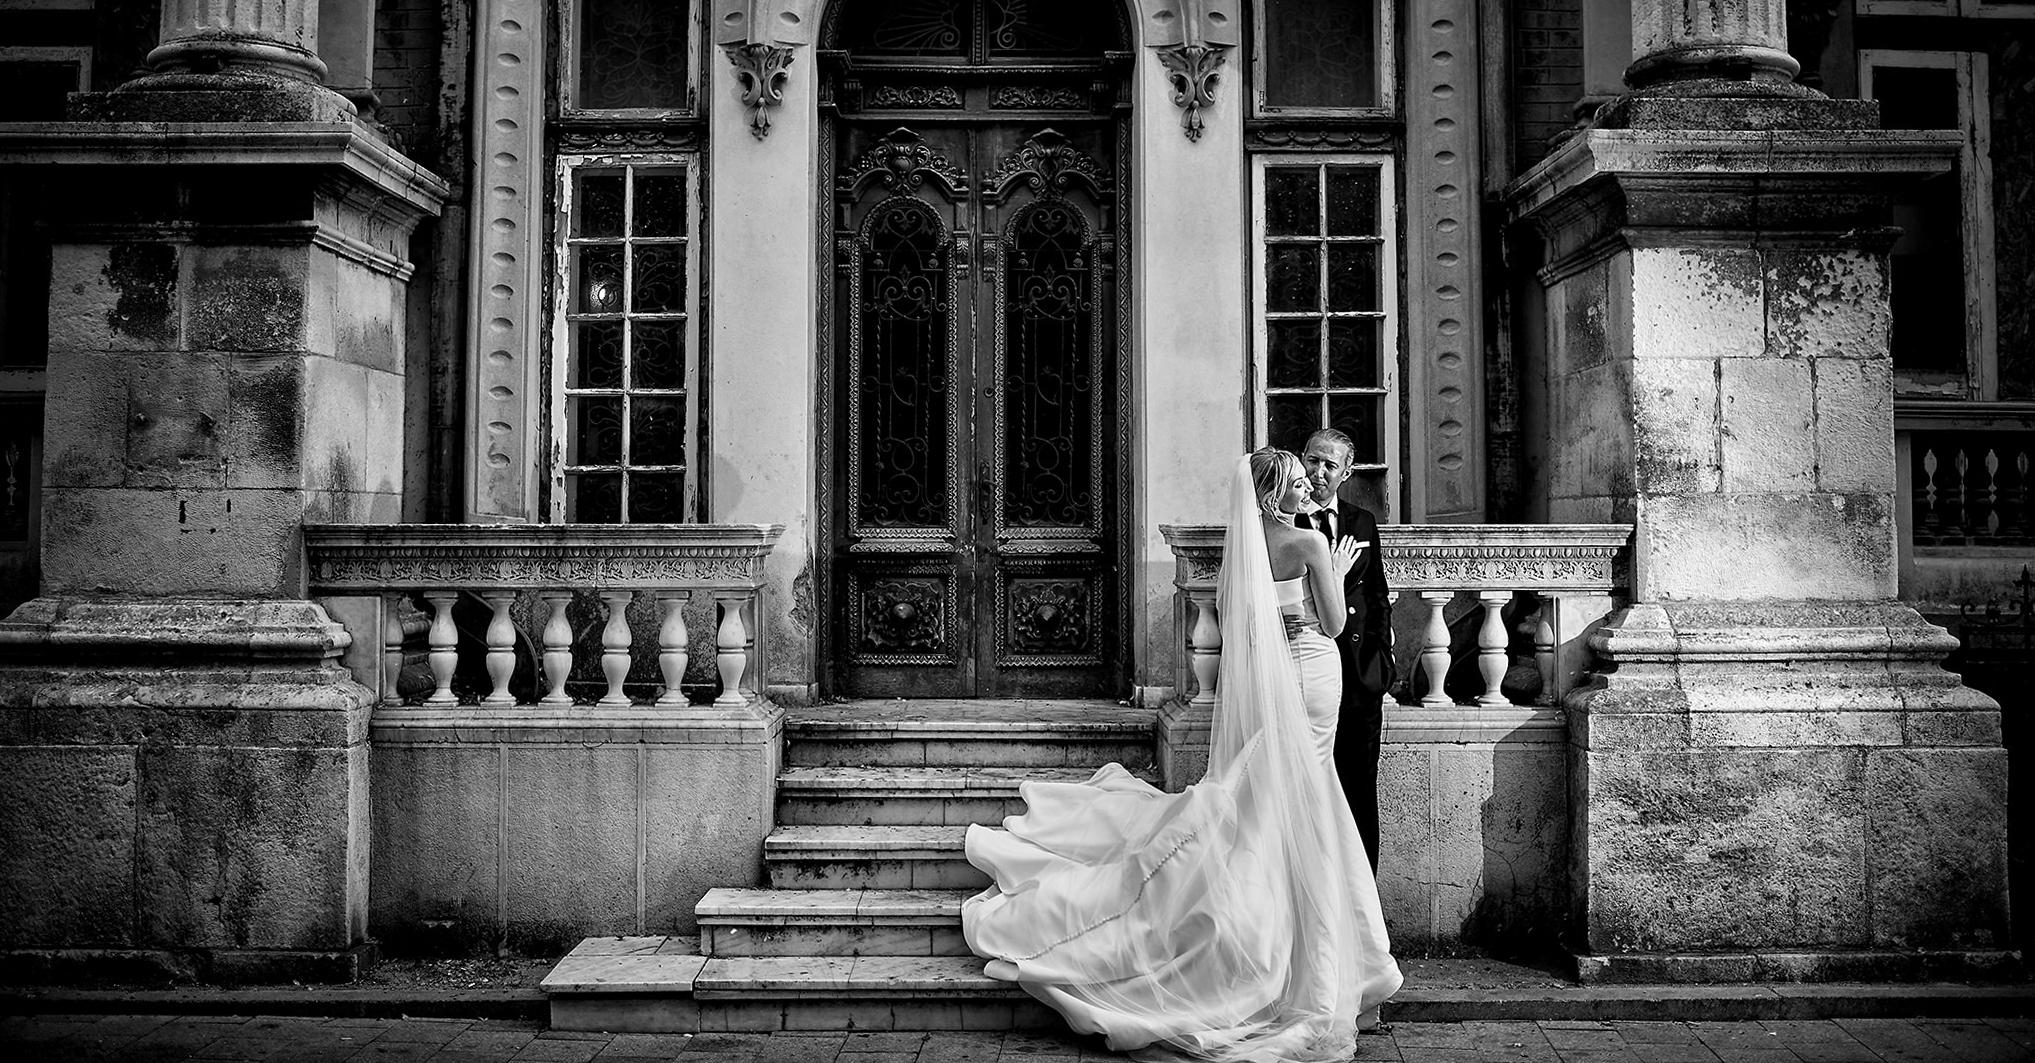 Nunta Ghiuler si Iselin23 1